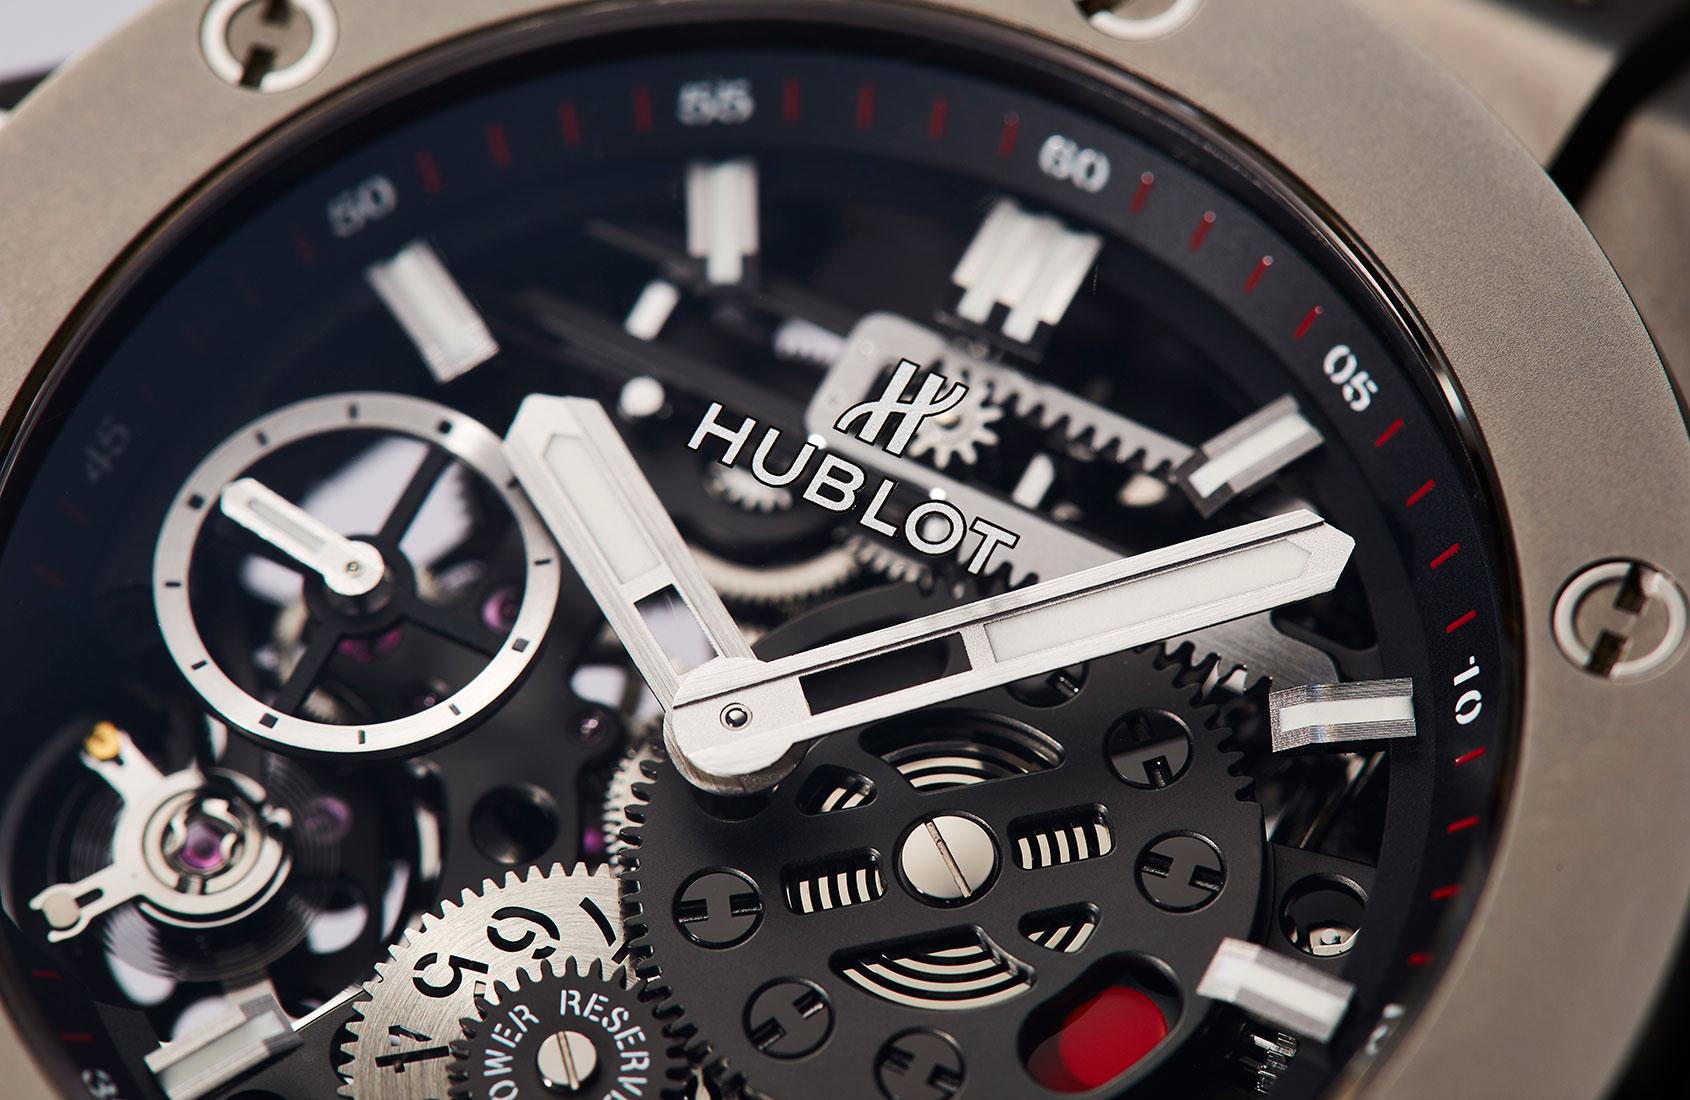 hublot-big-bang-meca-10-review-7